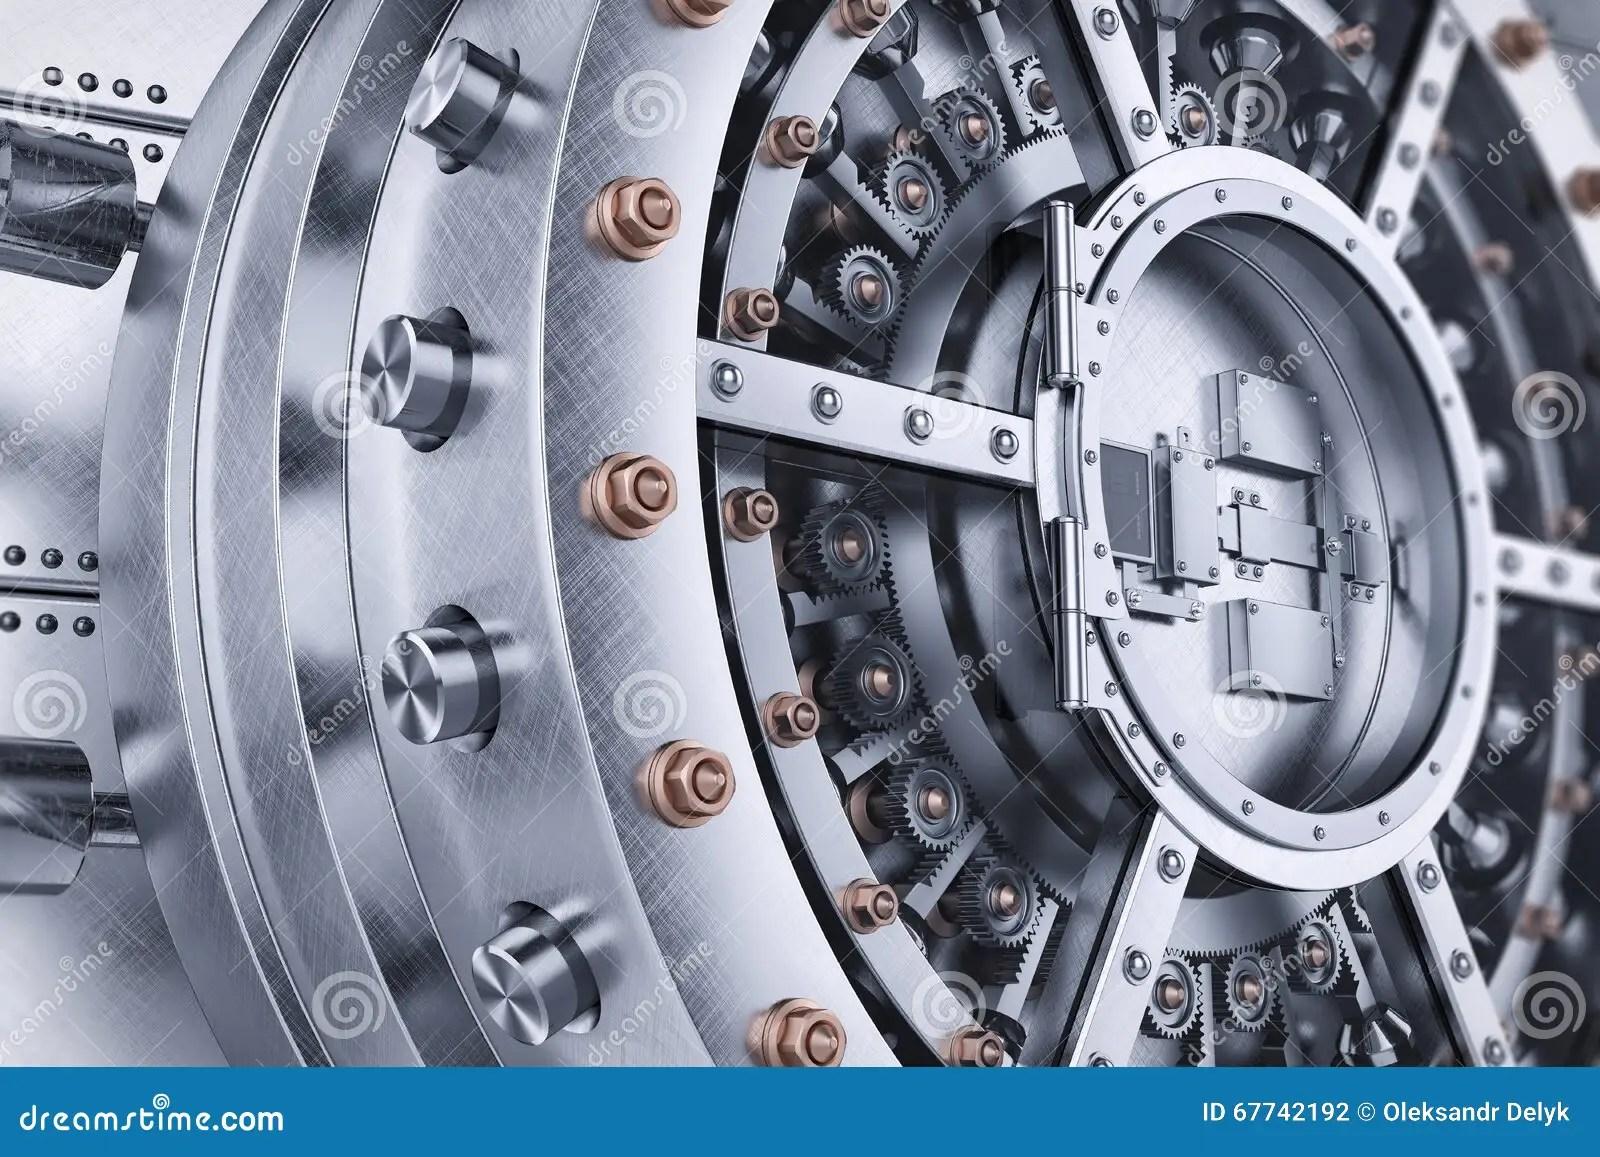 Security Bank Deposit Machine